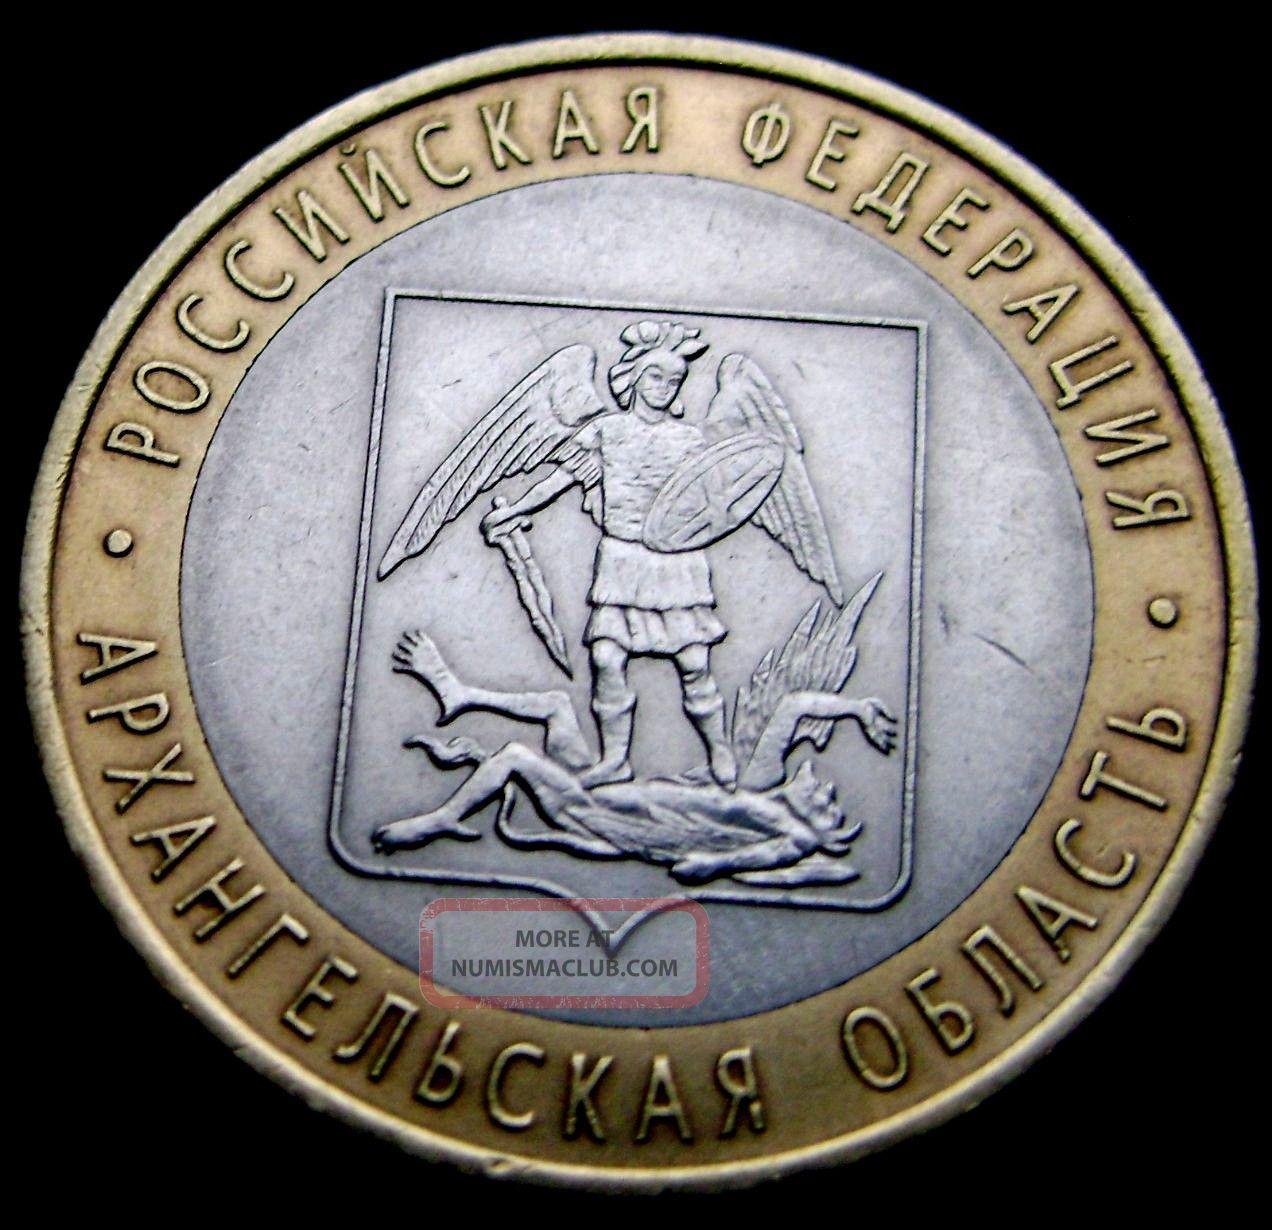 Russia.  10 Roubles 2007,  Archangelskaya Oblast.  Вi - Metallic. Federation (1992-Now) photo